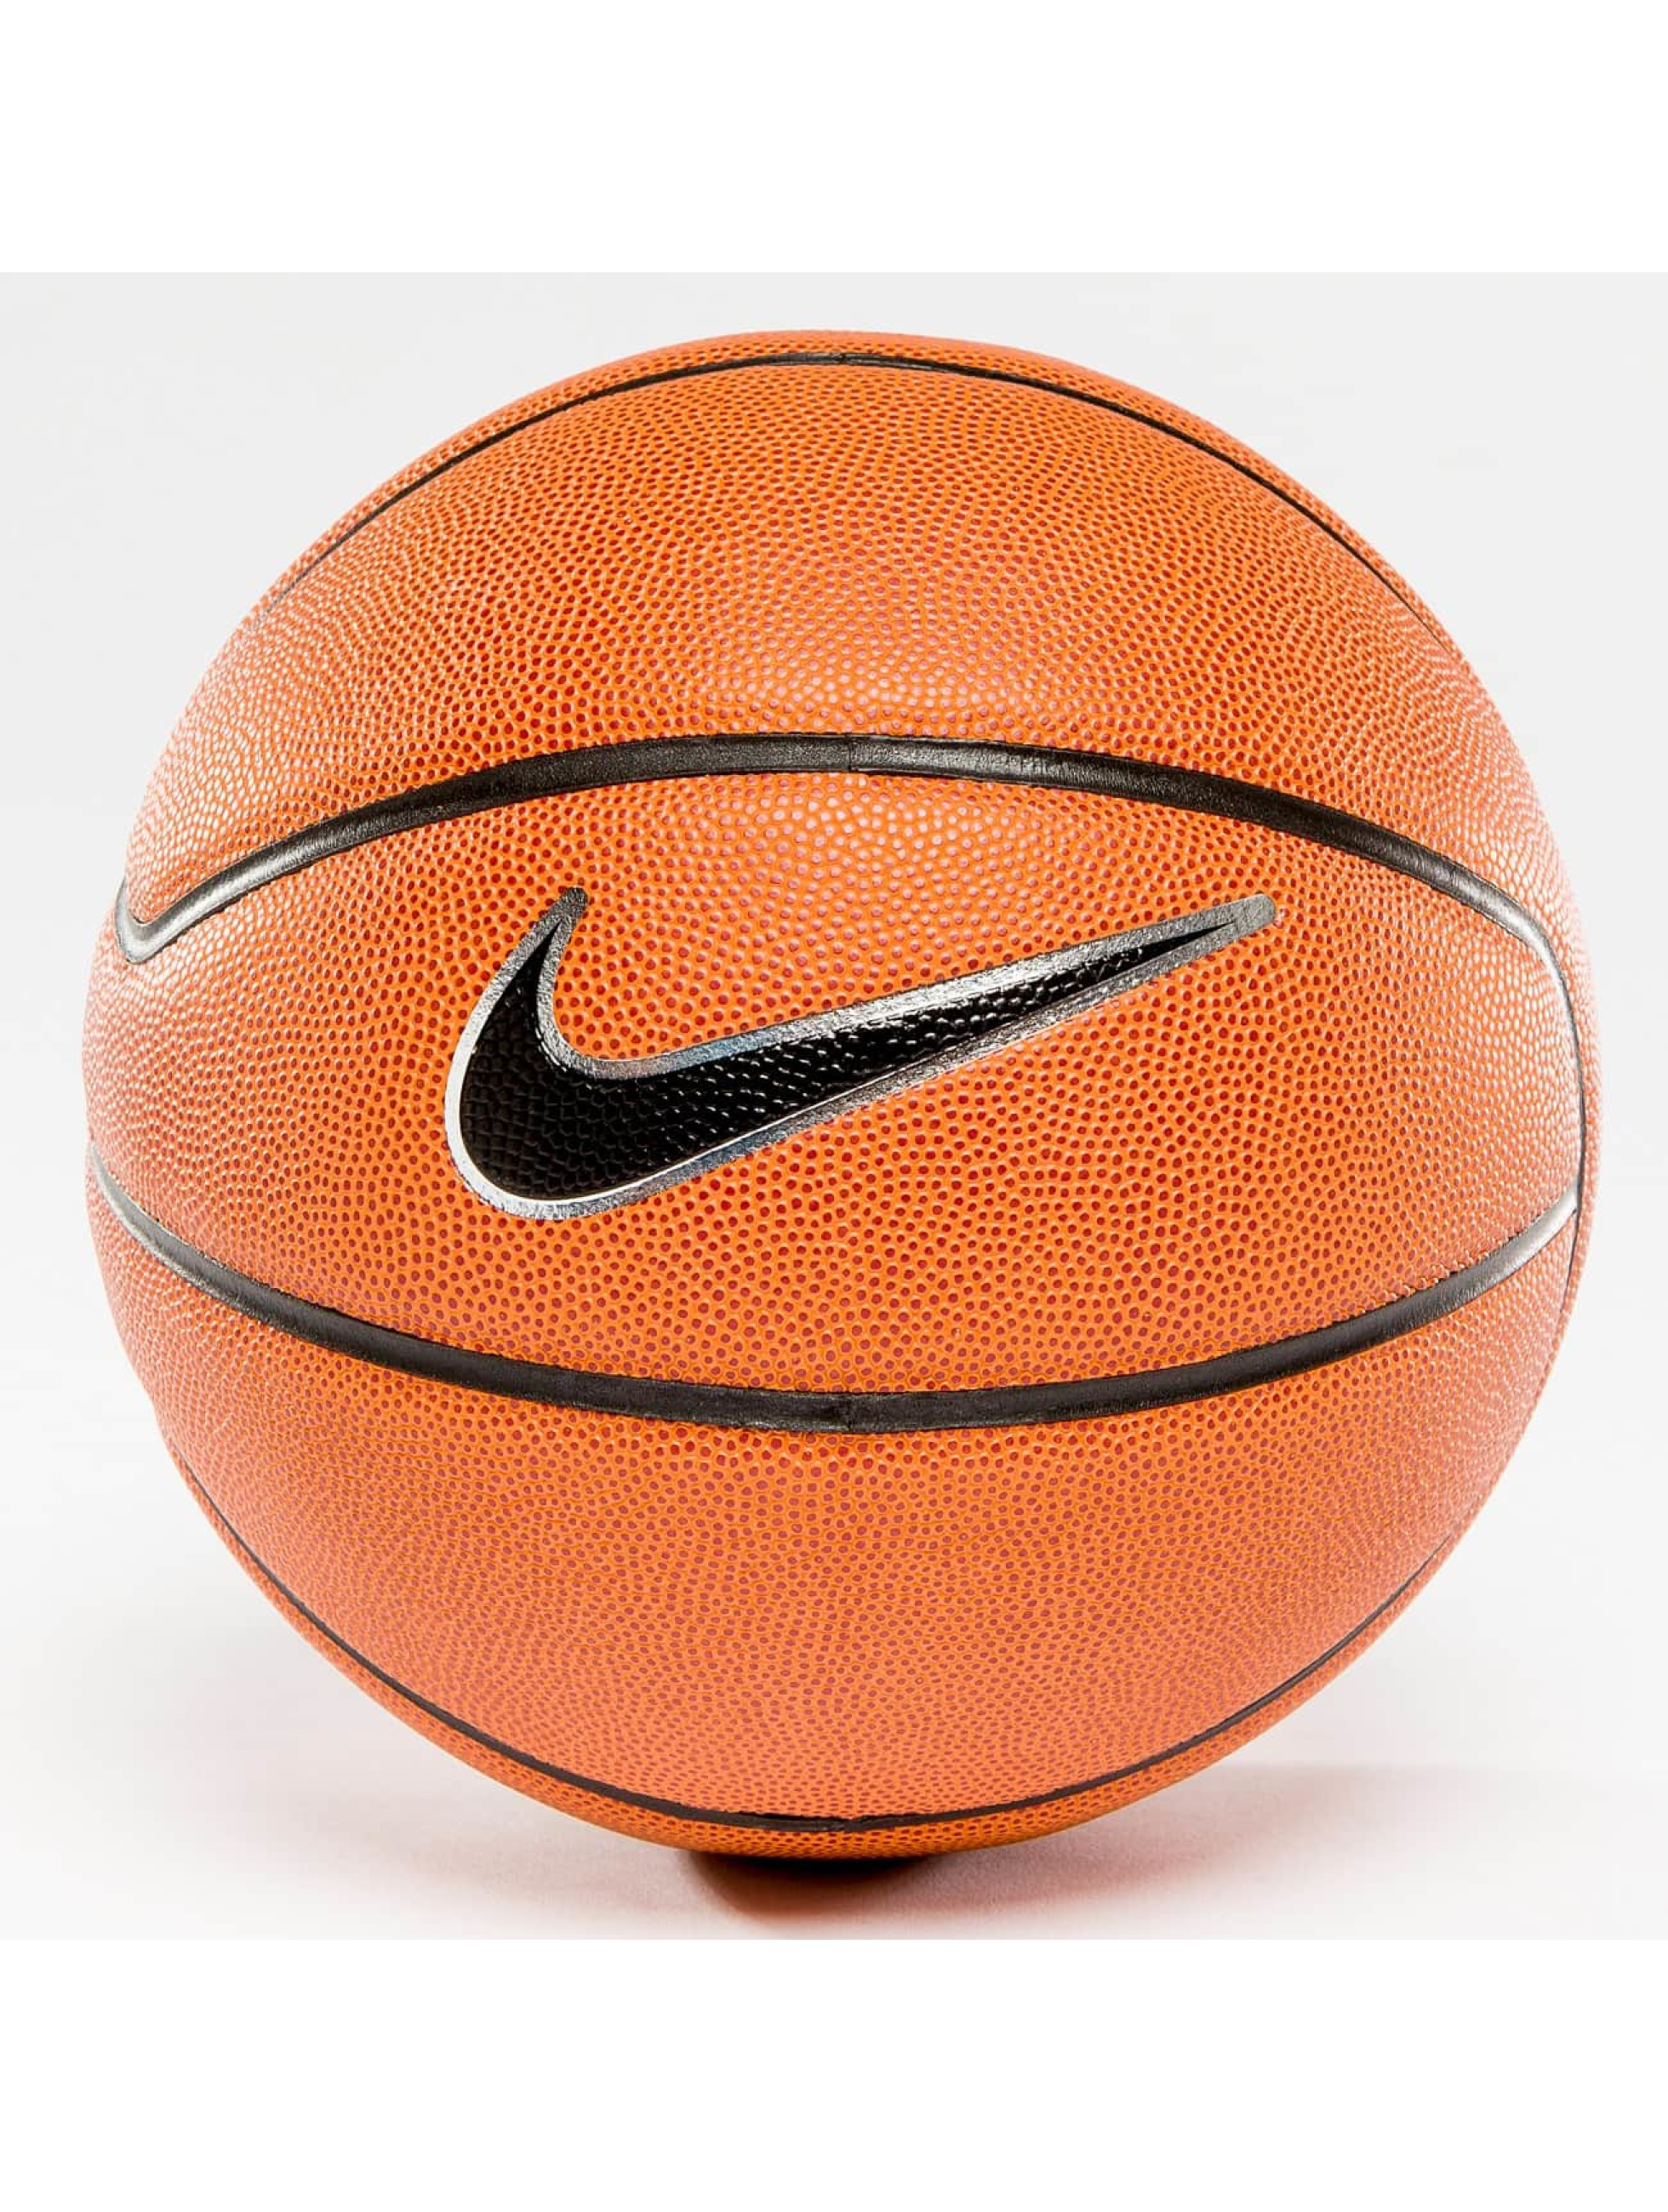 Nike Performance Männer,Frauen,Kinder Ball KD Outdoor 8P in orange